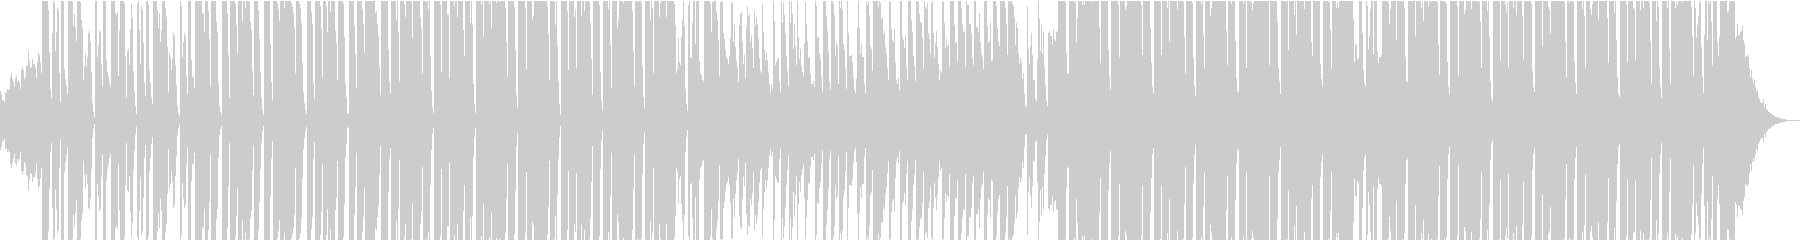 House Backgroundの未再生の波形